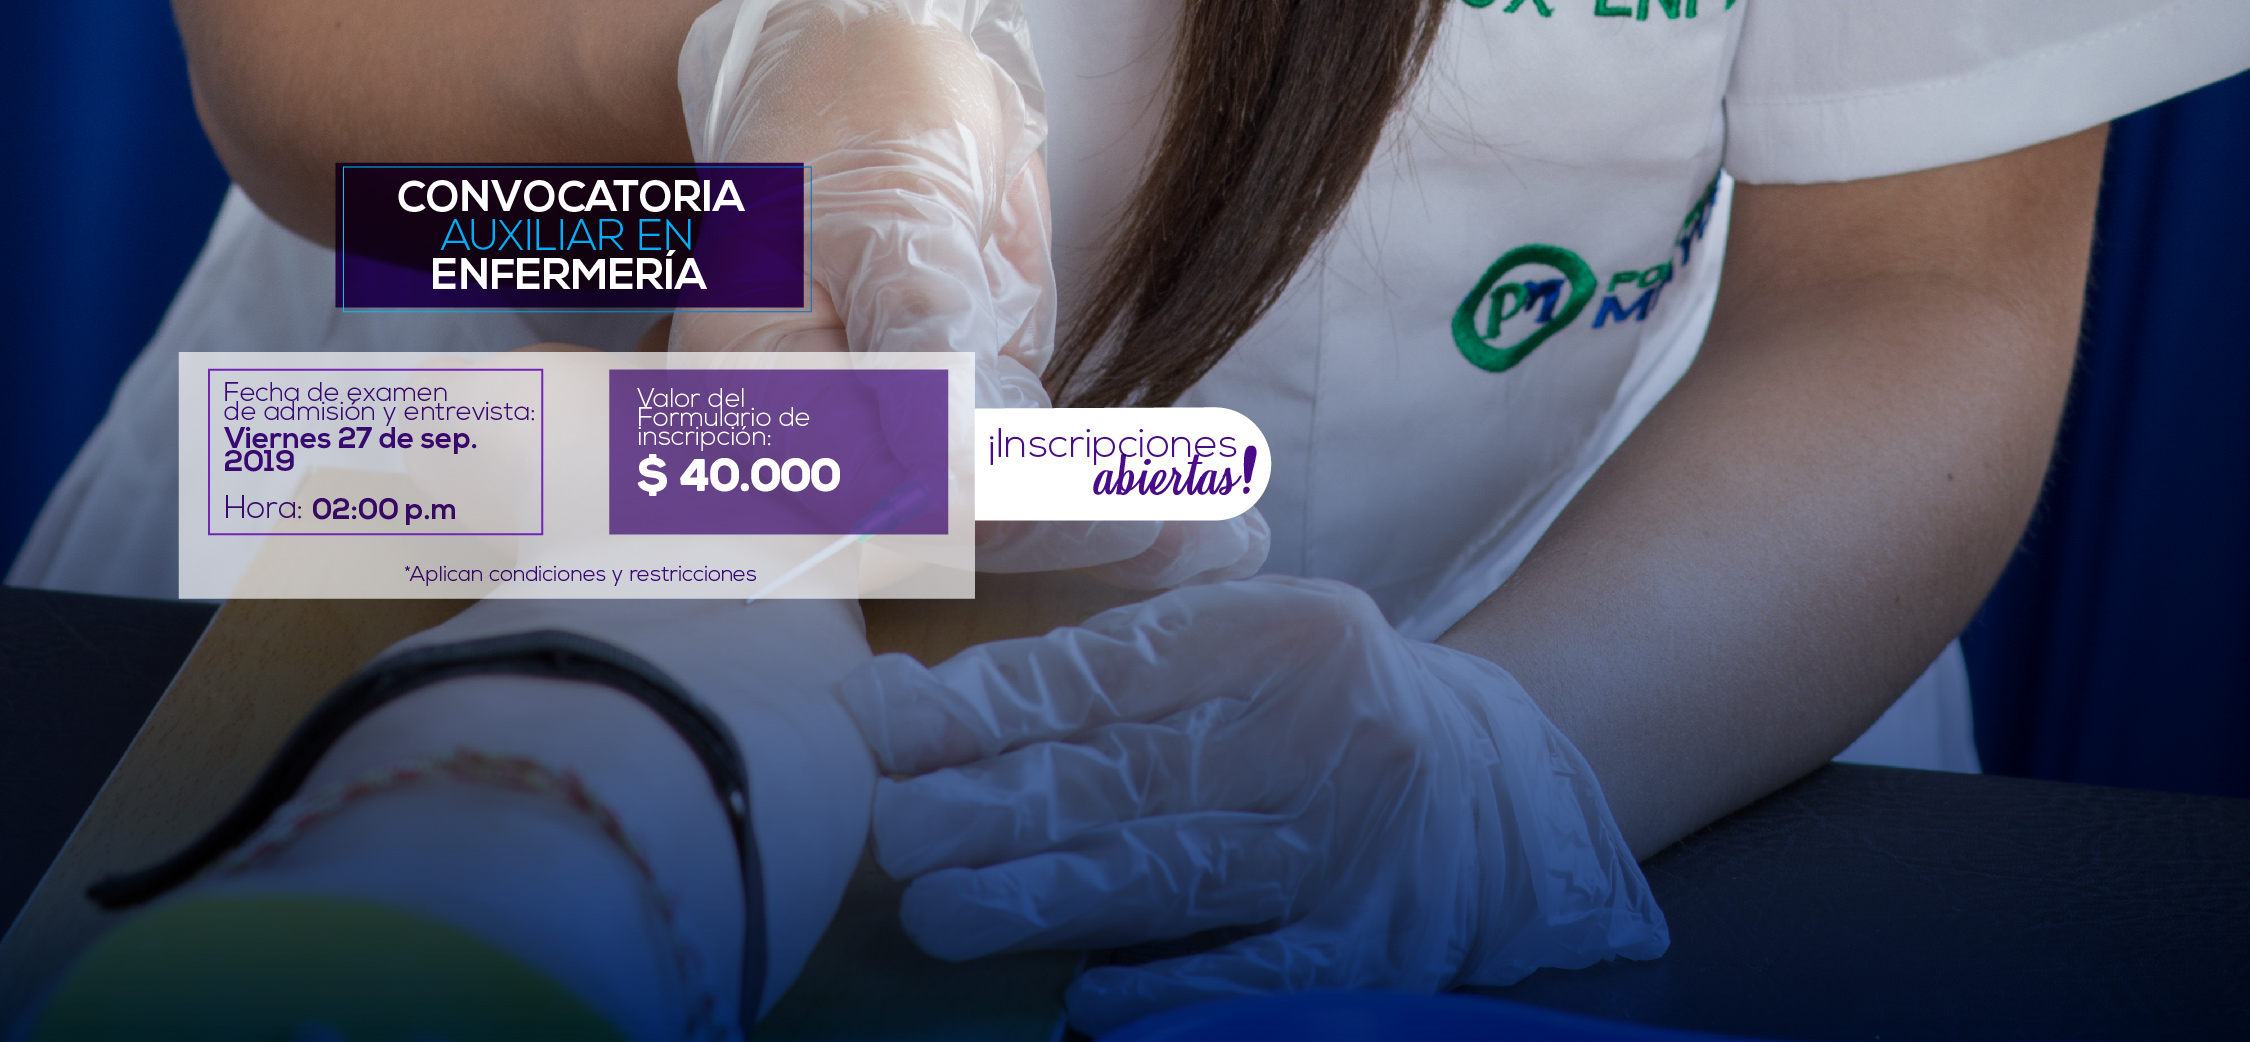 Convocatoria_auxiliar_en_enfermera_27_de_septiembre_2019_slide-01